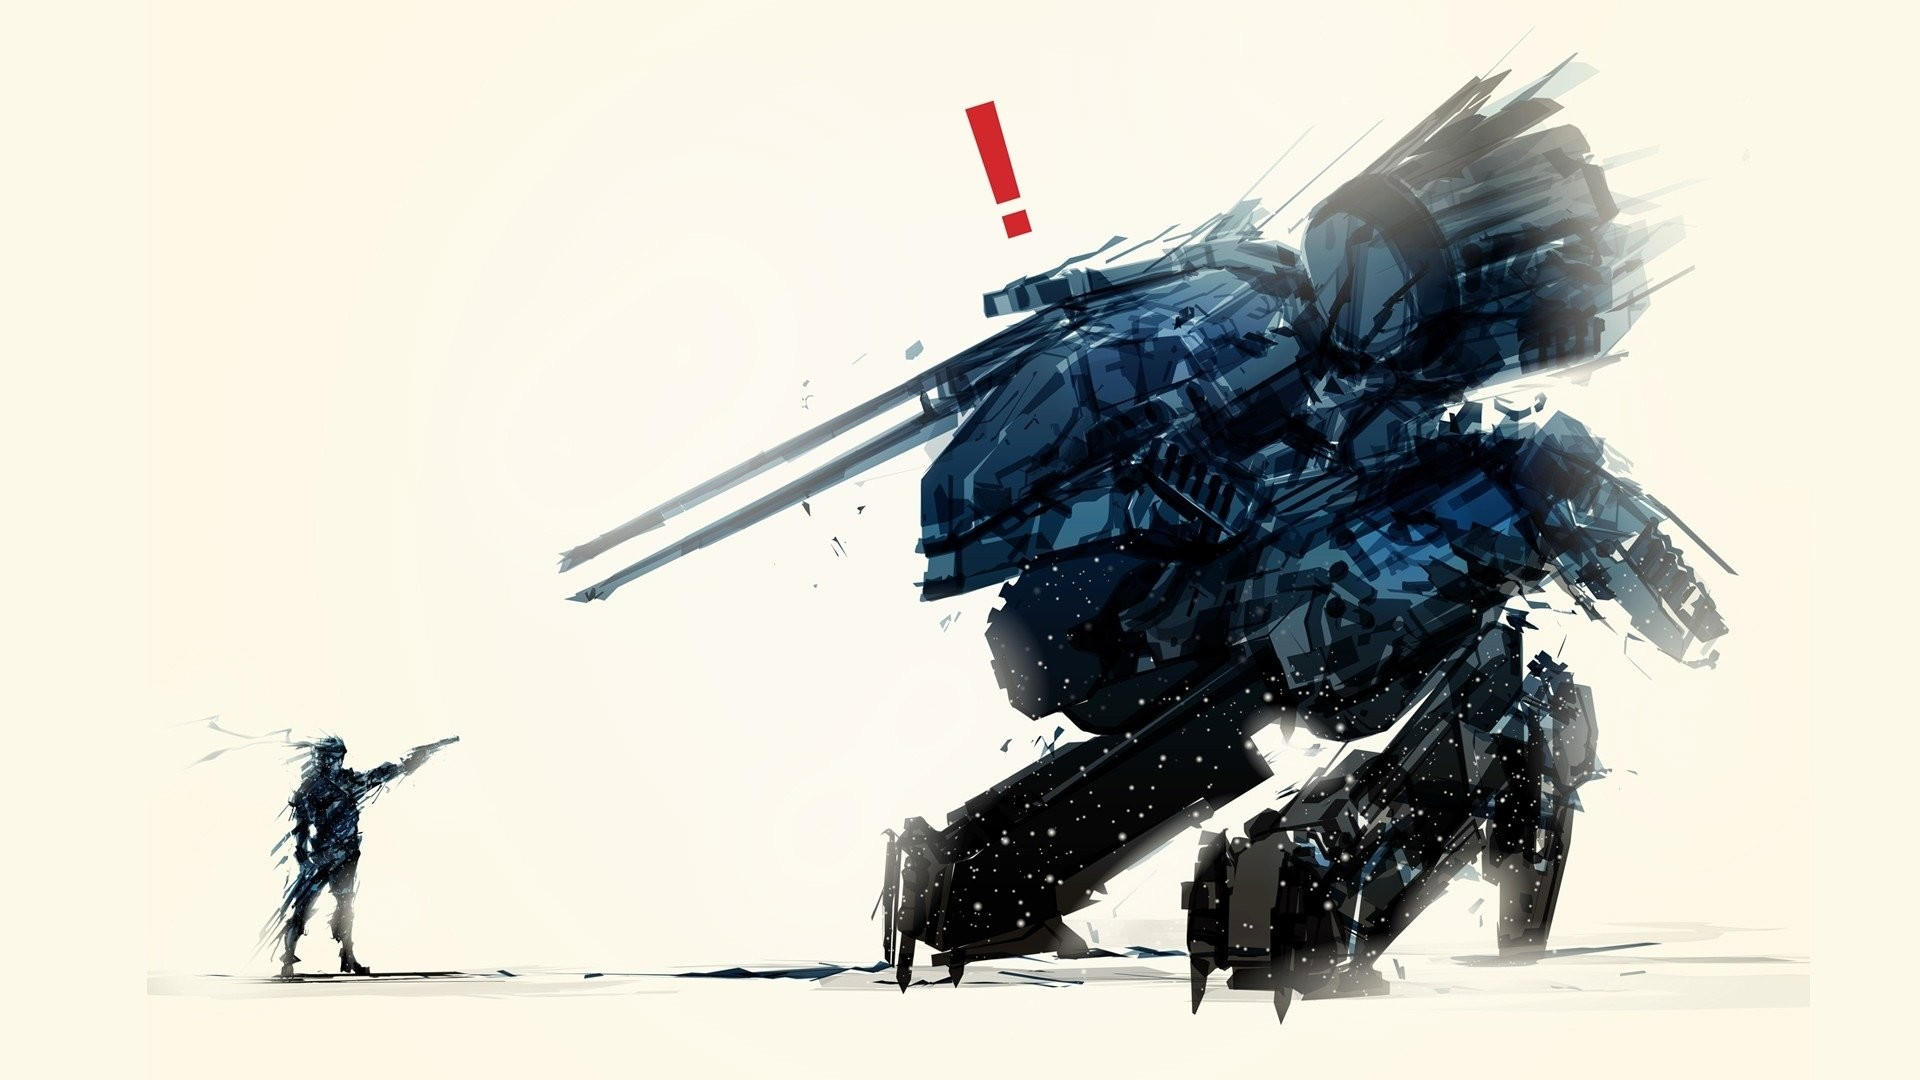 Big Boss Metal Gear Solid Solid Snake · HD Wallpaper   Background ID:423164